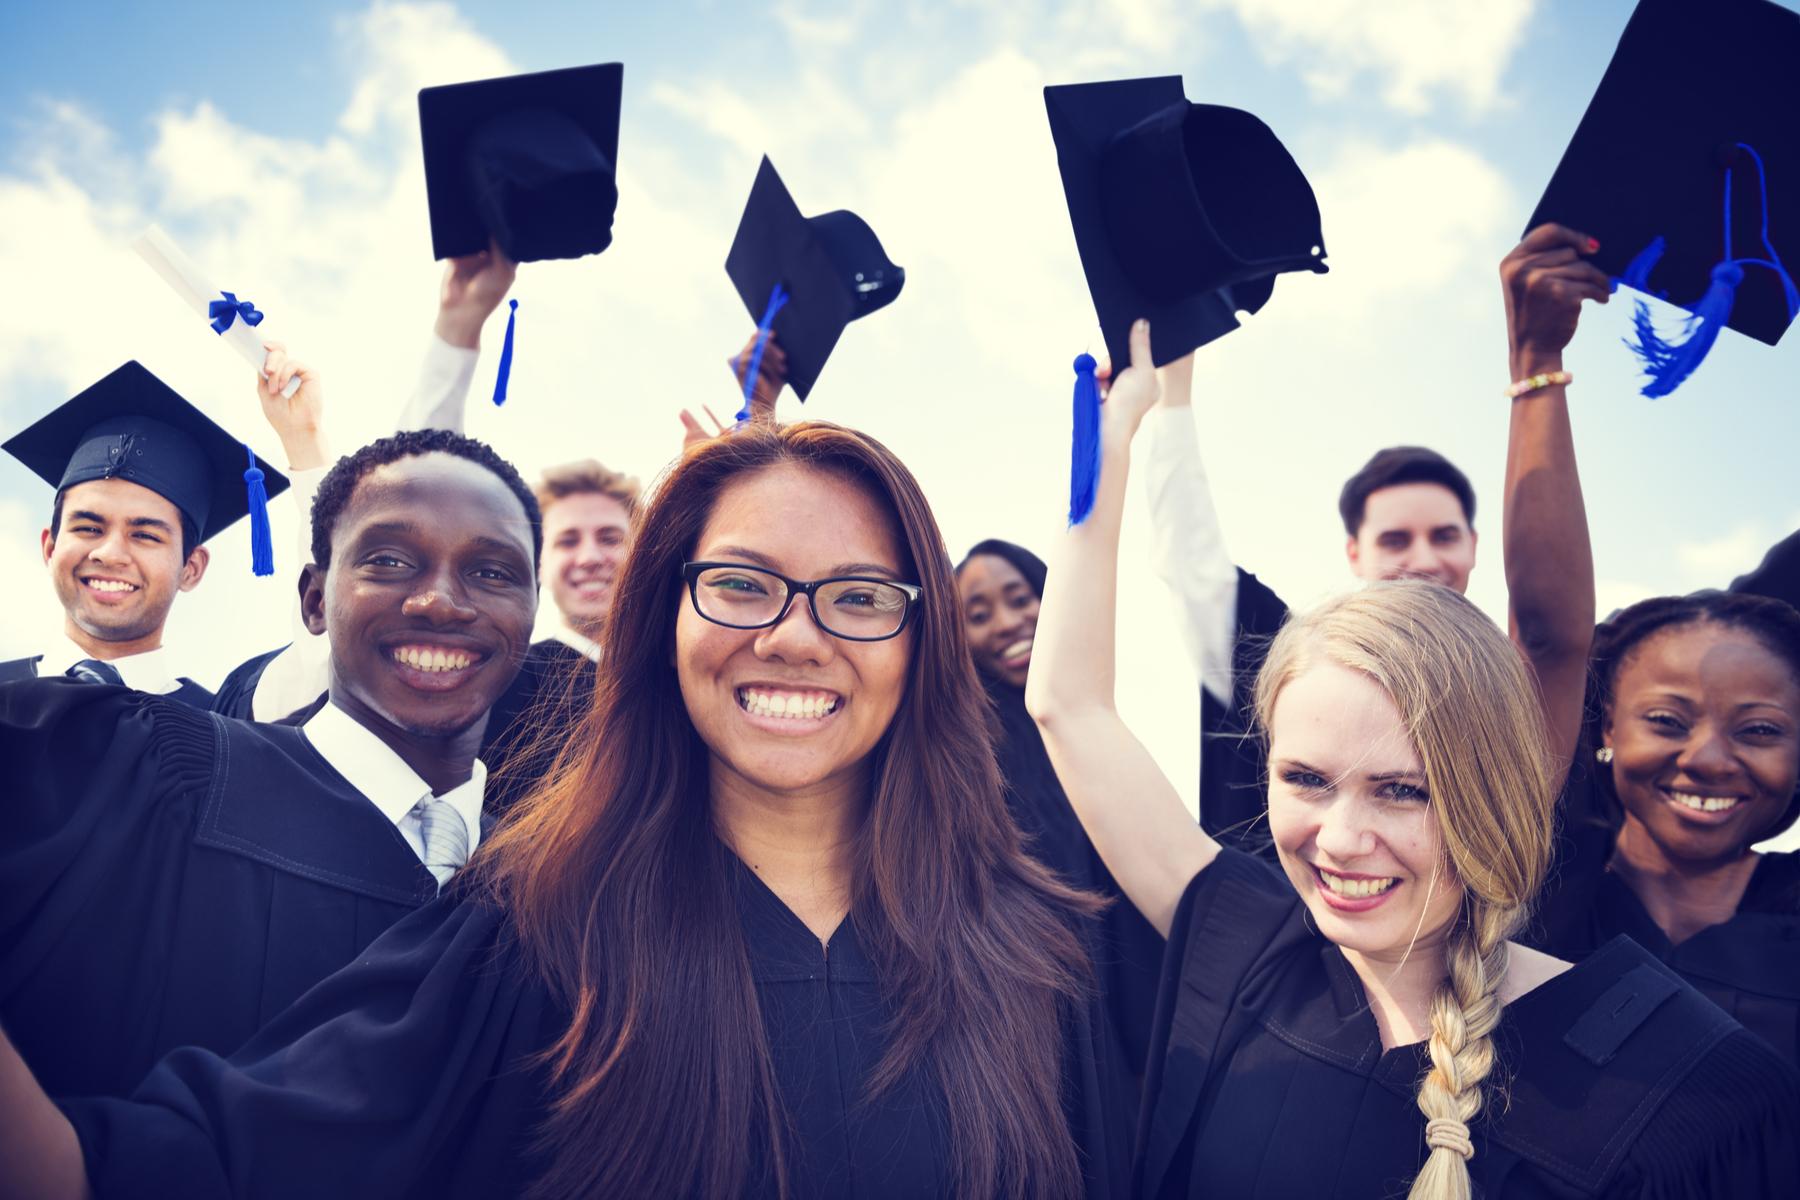 group of Swiss university students celebrating graduation